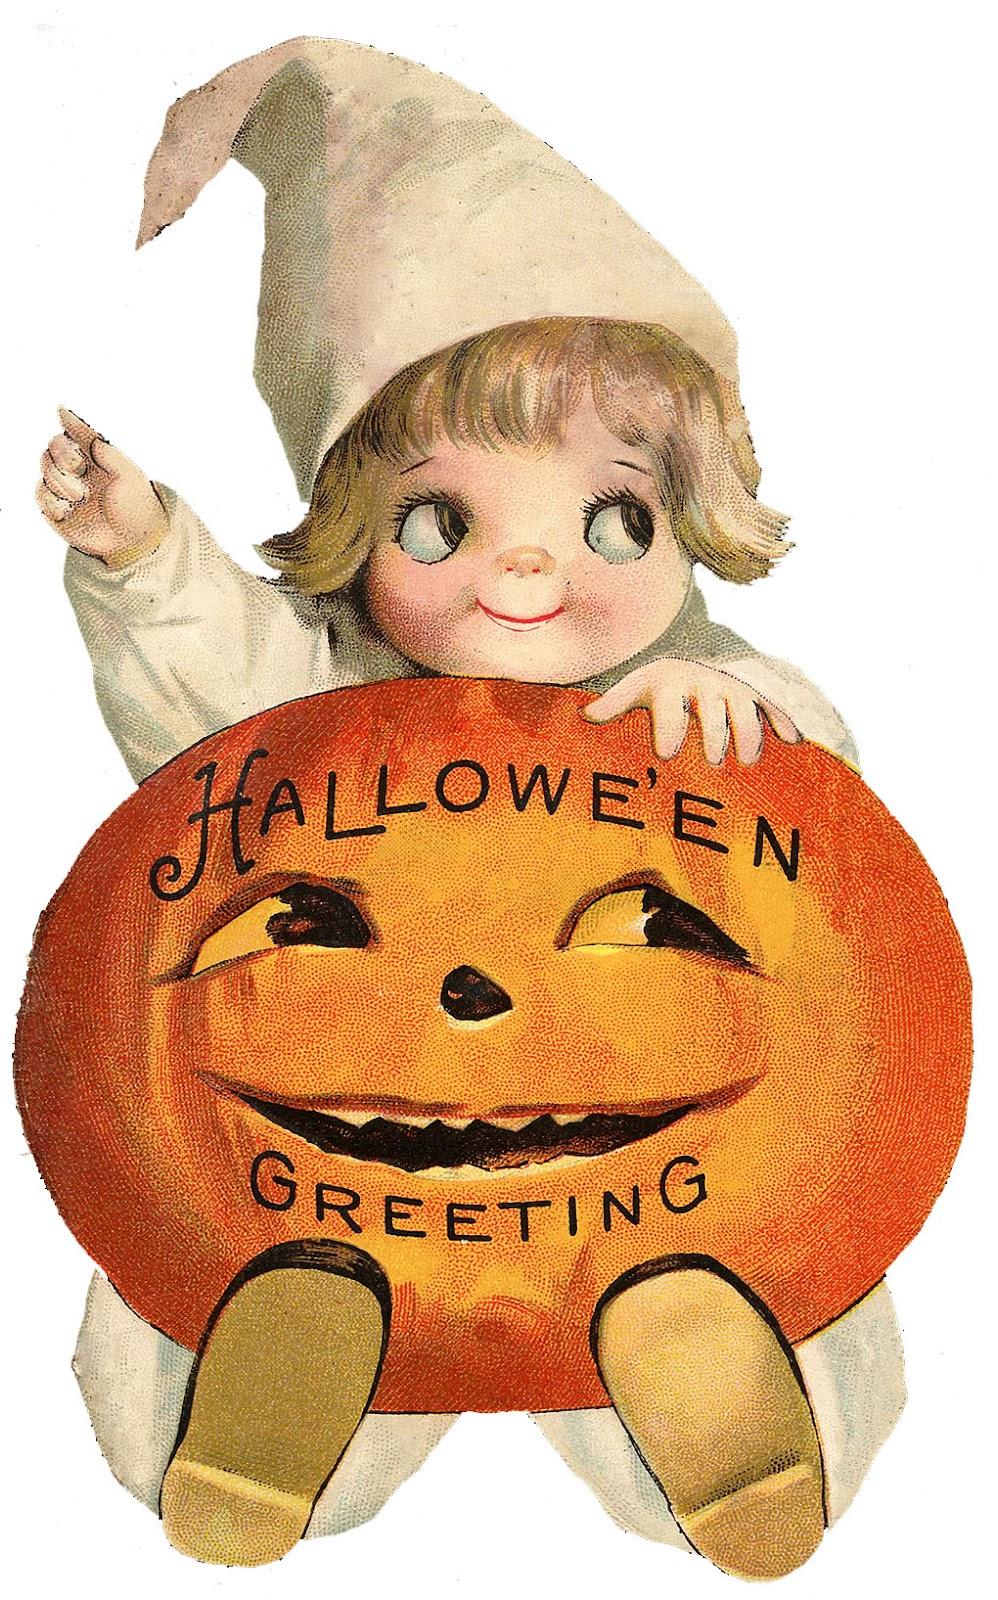 Halloween character pumpkin girl clipart freeuse stock Vintage Halloween Clip Art - Googly Eye Pumpkin Girl - The ... freeuse stock